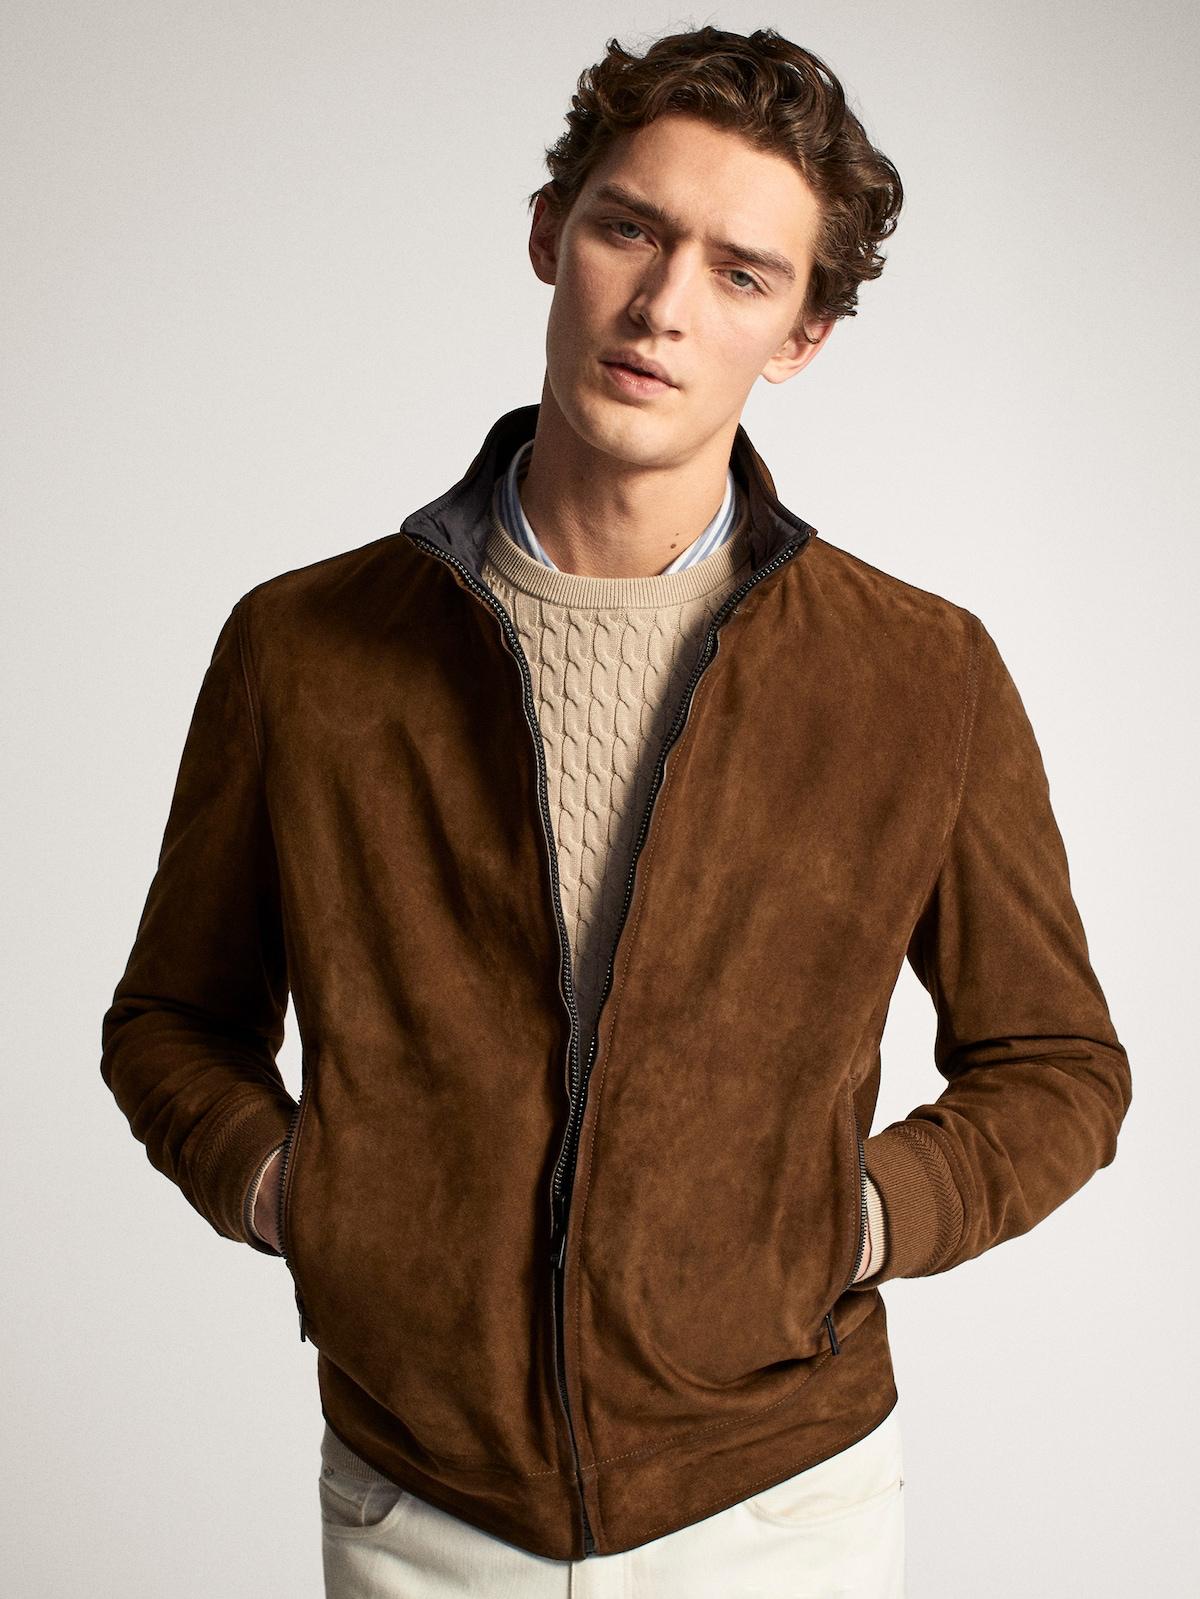 Layering Piece Men Fashion Suede Bomber Jacket Men Suede Bomber Jacket Leather Jacket Men Style